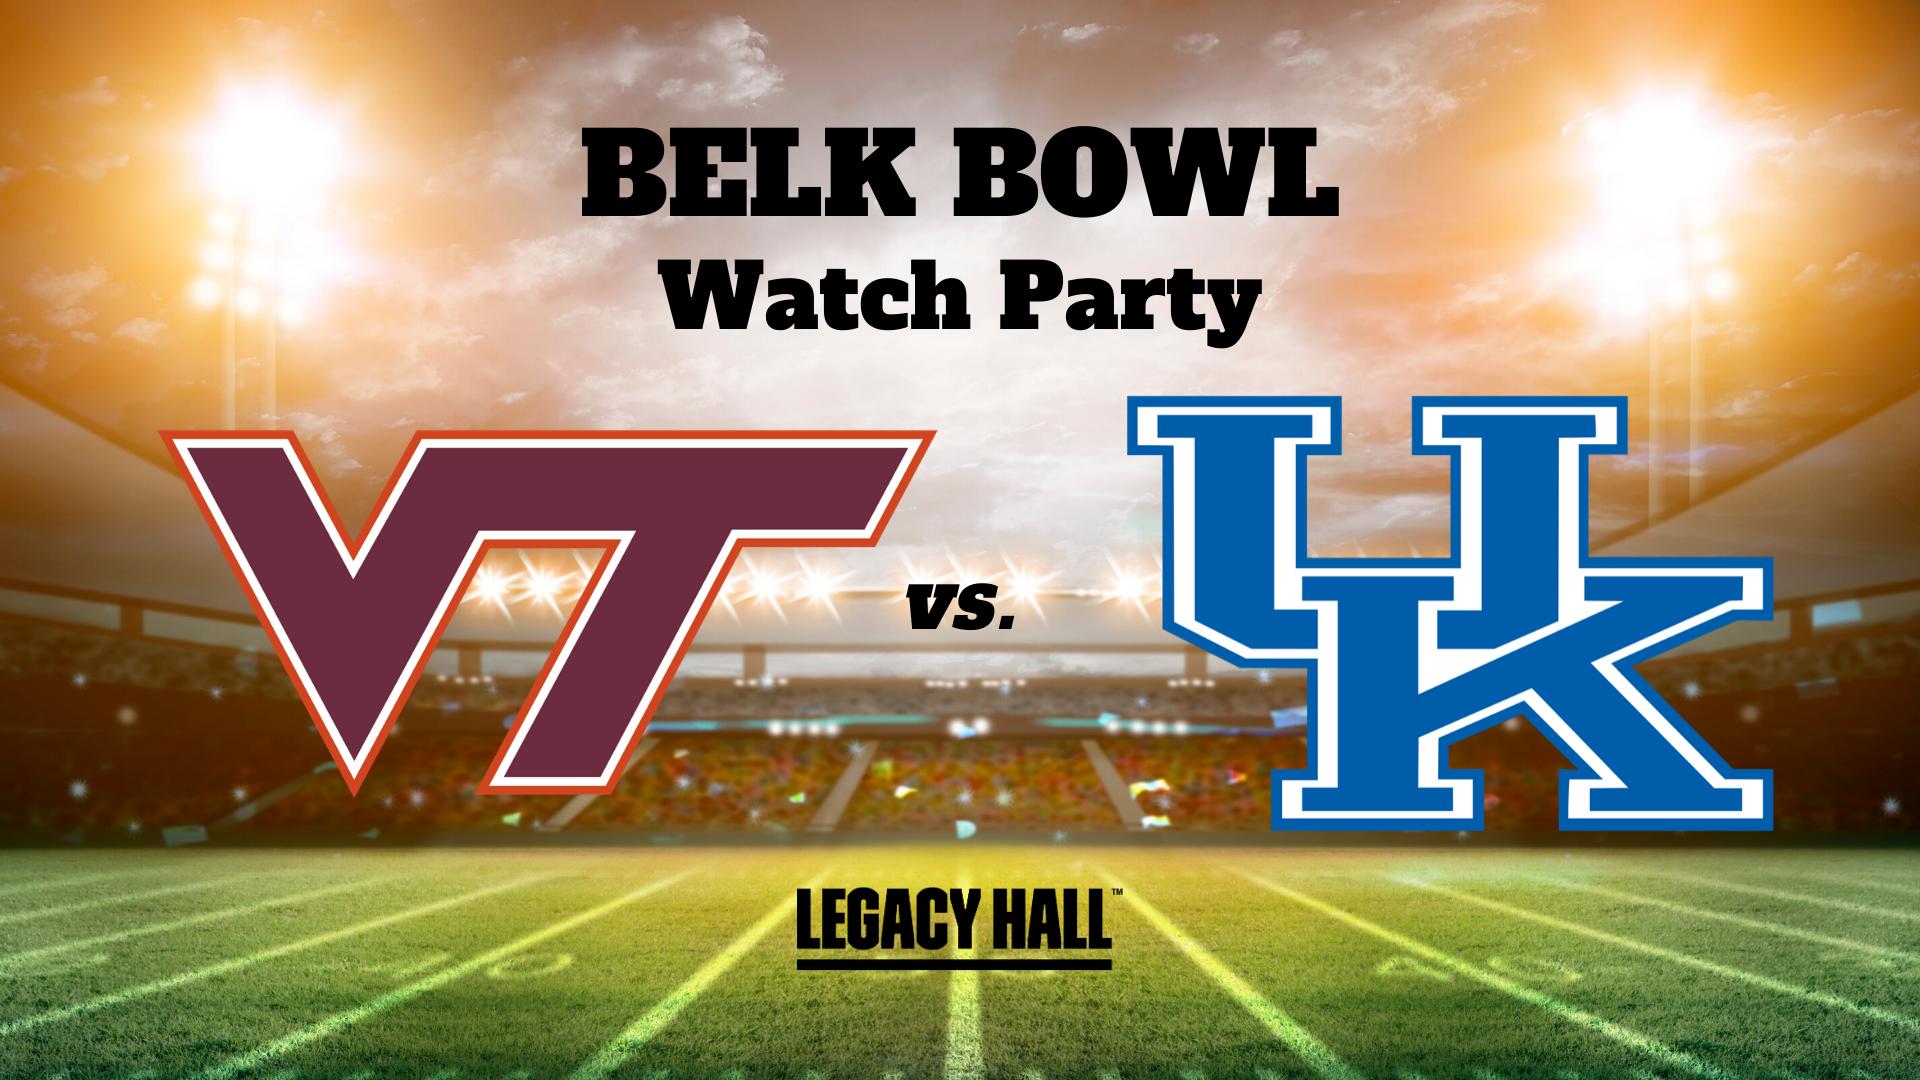 Belk Bowl Watch Party - hero